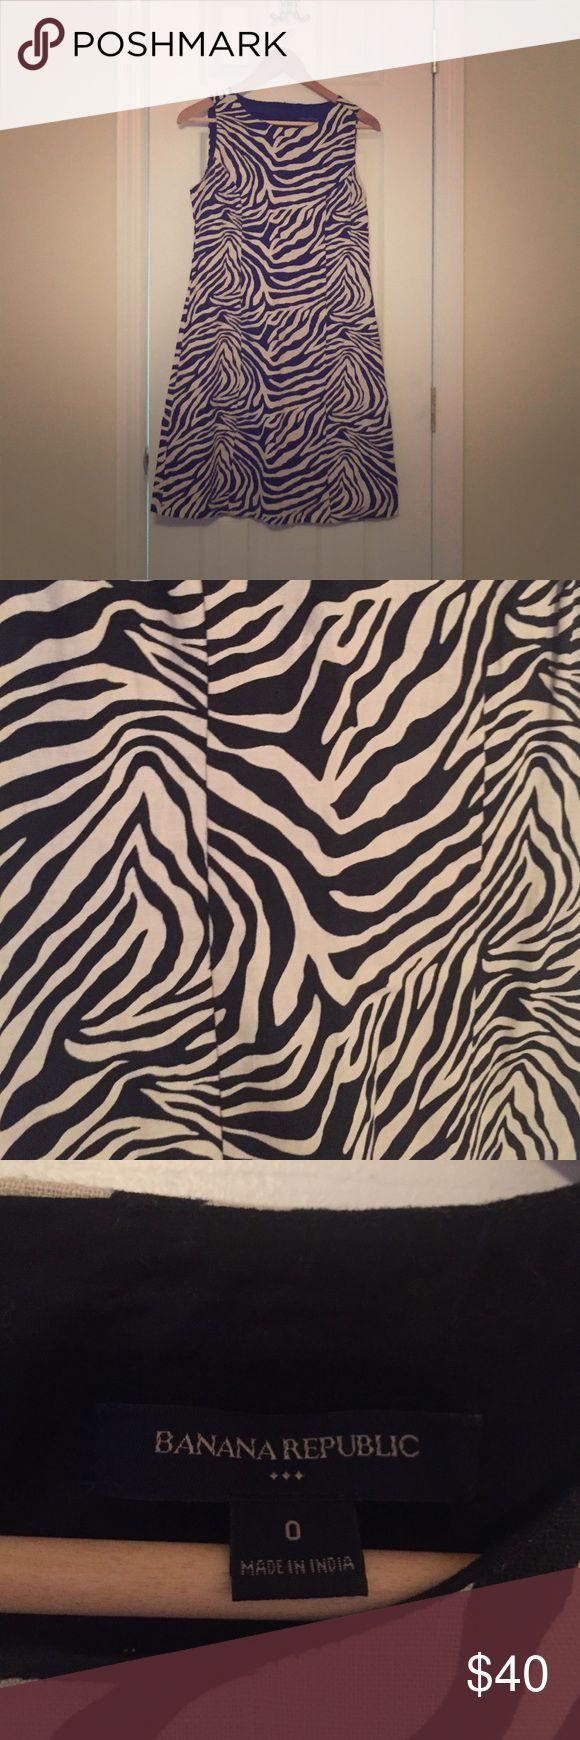 Banana Republic Zebra Print Dress Beautiful zebra print short sleeved dress. Very flattering. Banana Republic Dresses